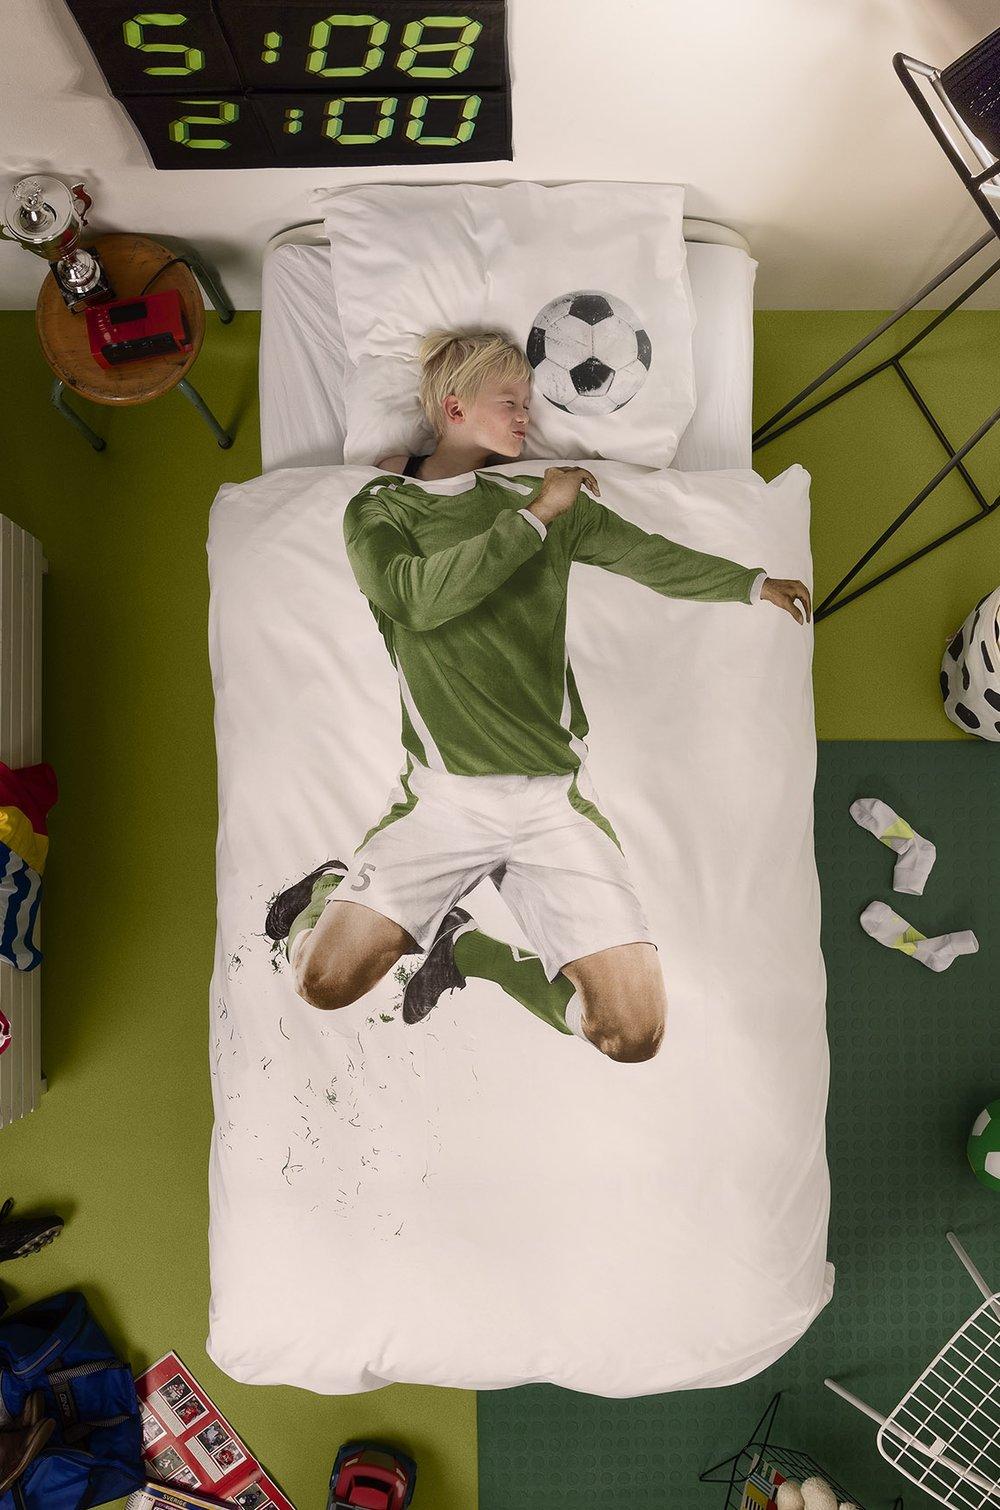 SoccerChamp_styled_01_Lo_RGB (1).jpg